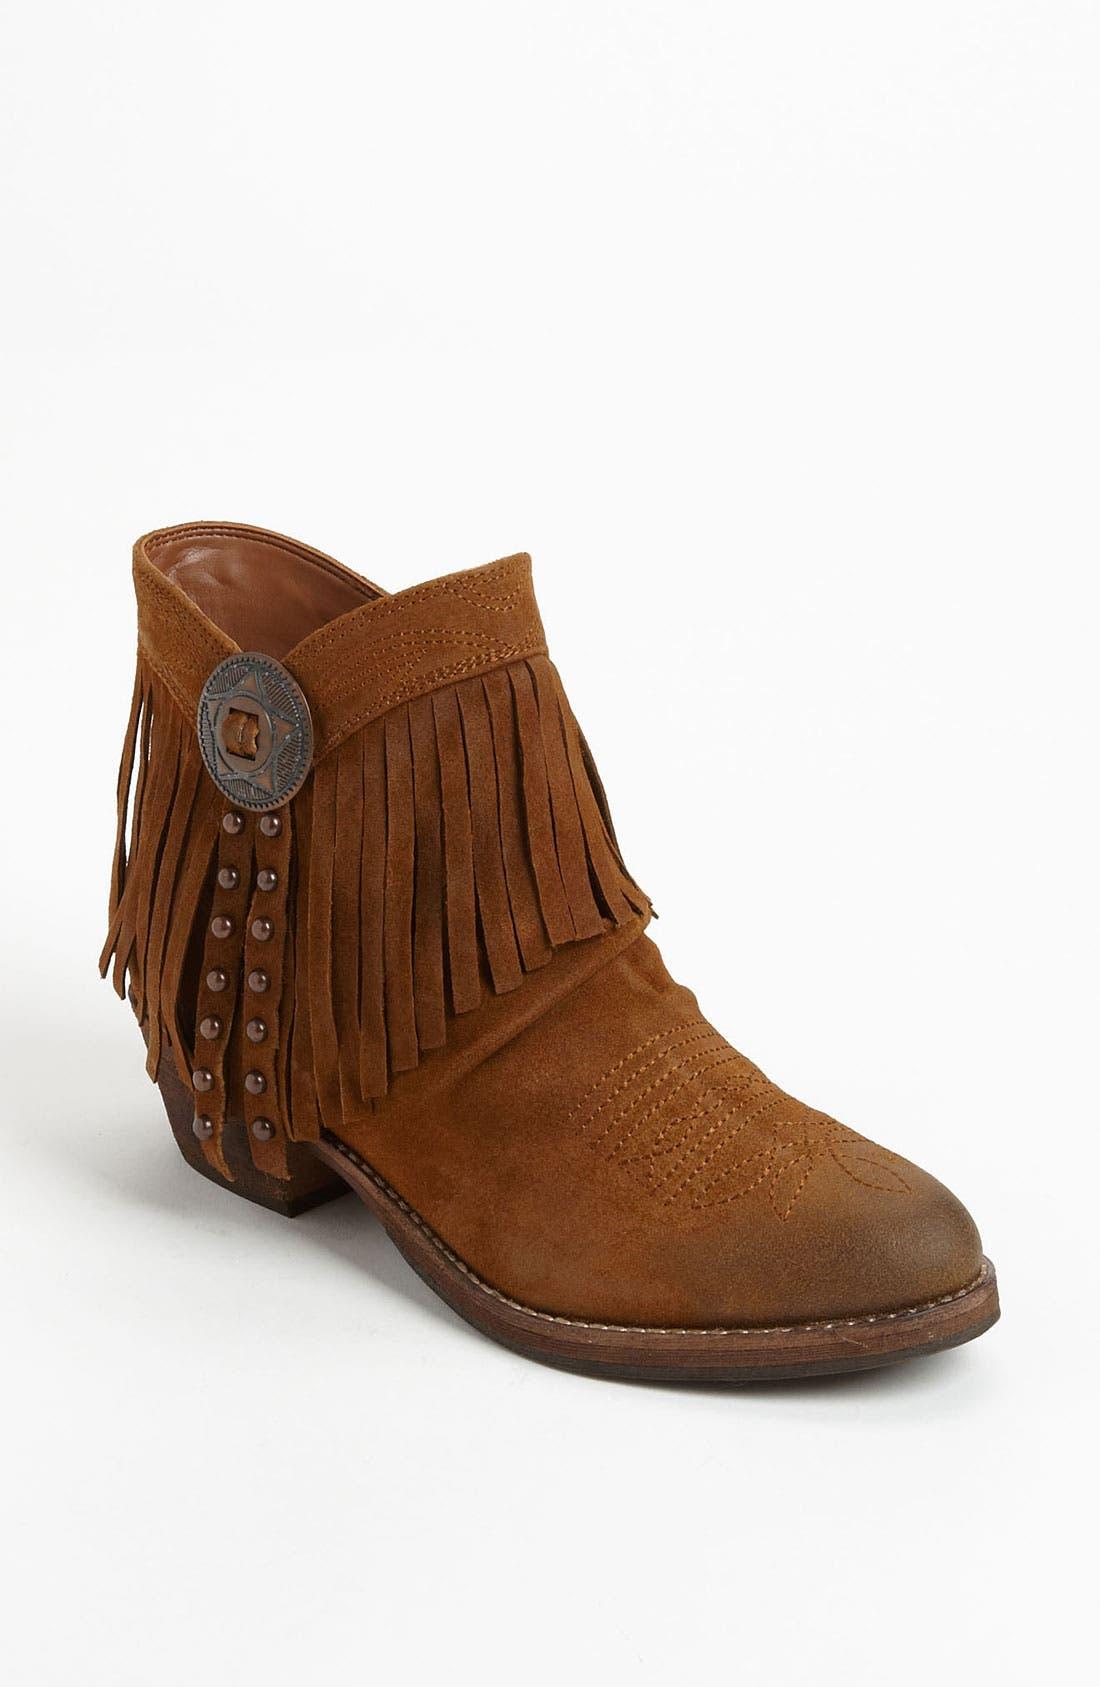 Alternate Image 1 Selected - Sam Edelman 'Sidney' Boot